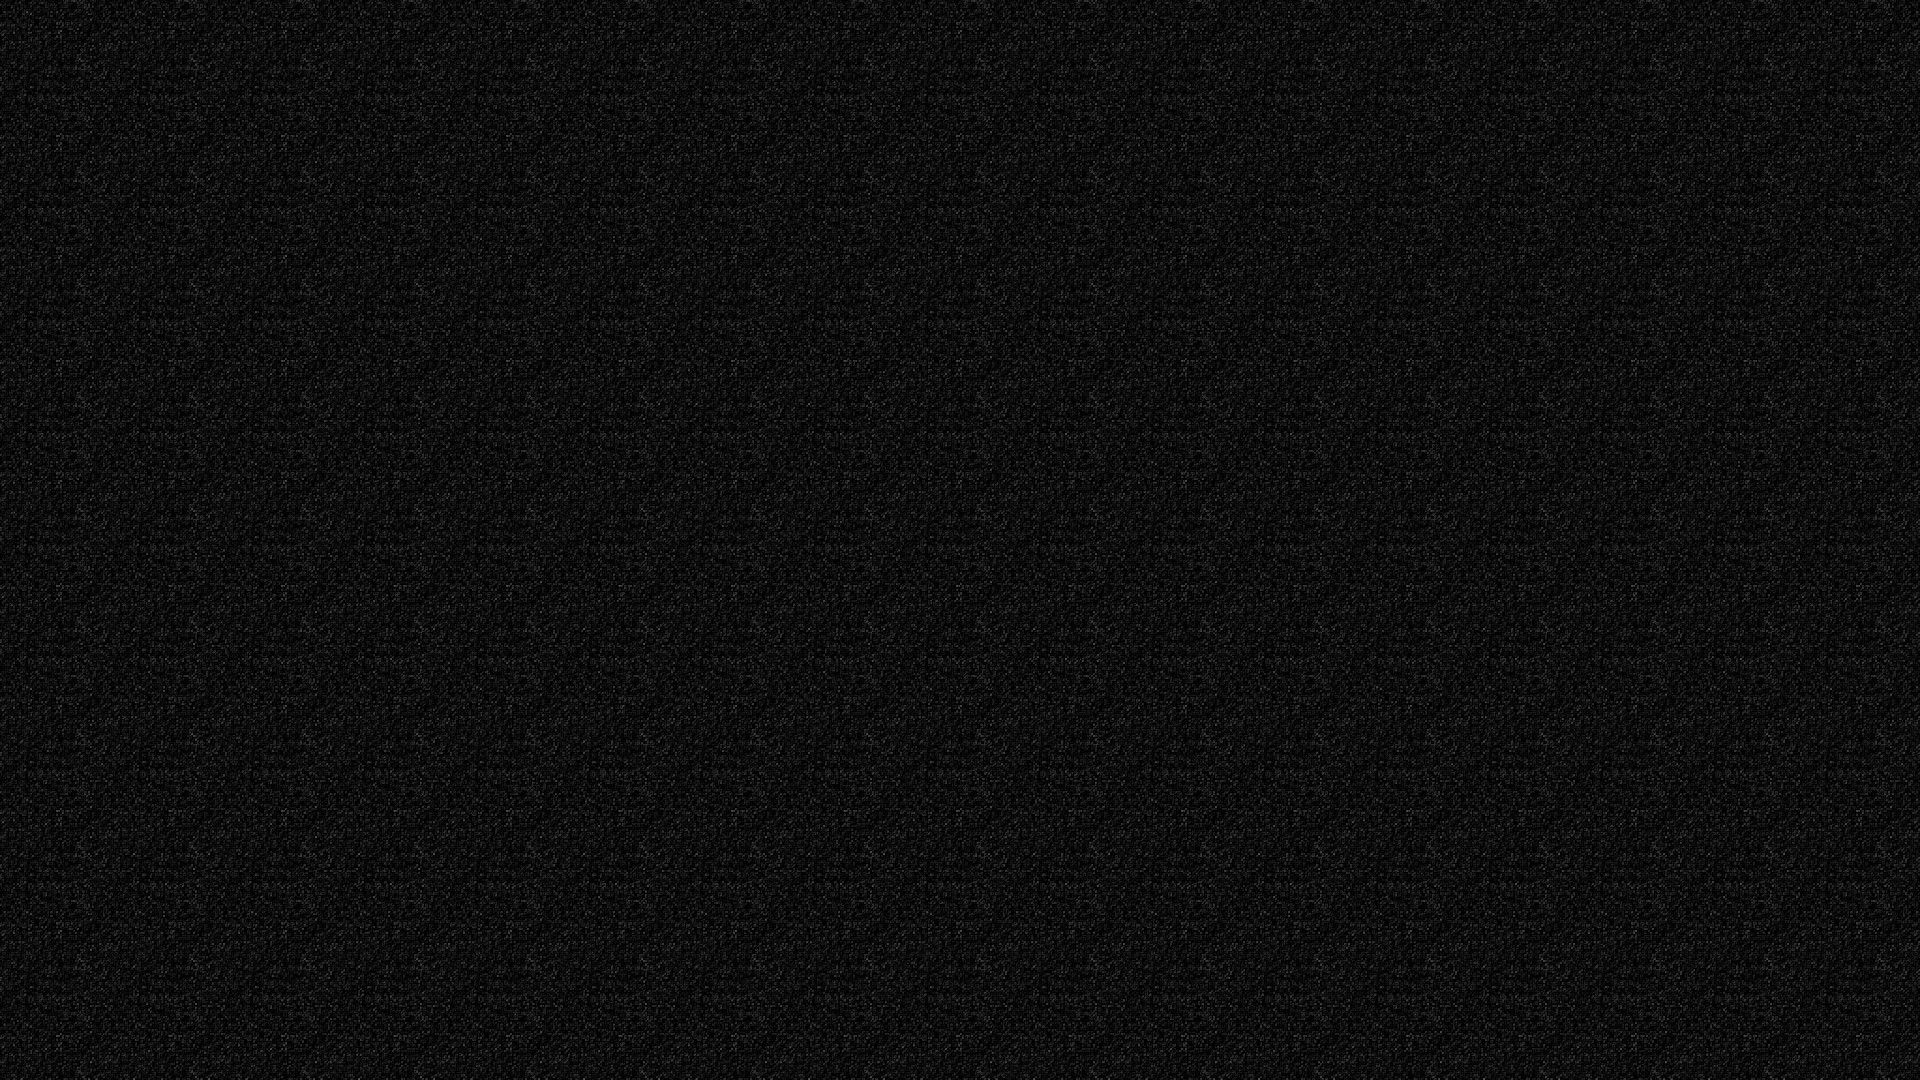 High Resolution Black Background image